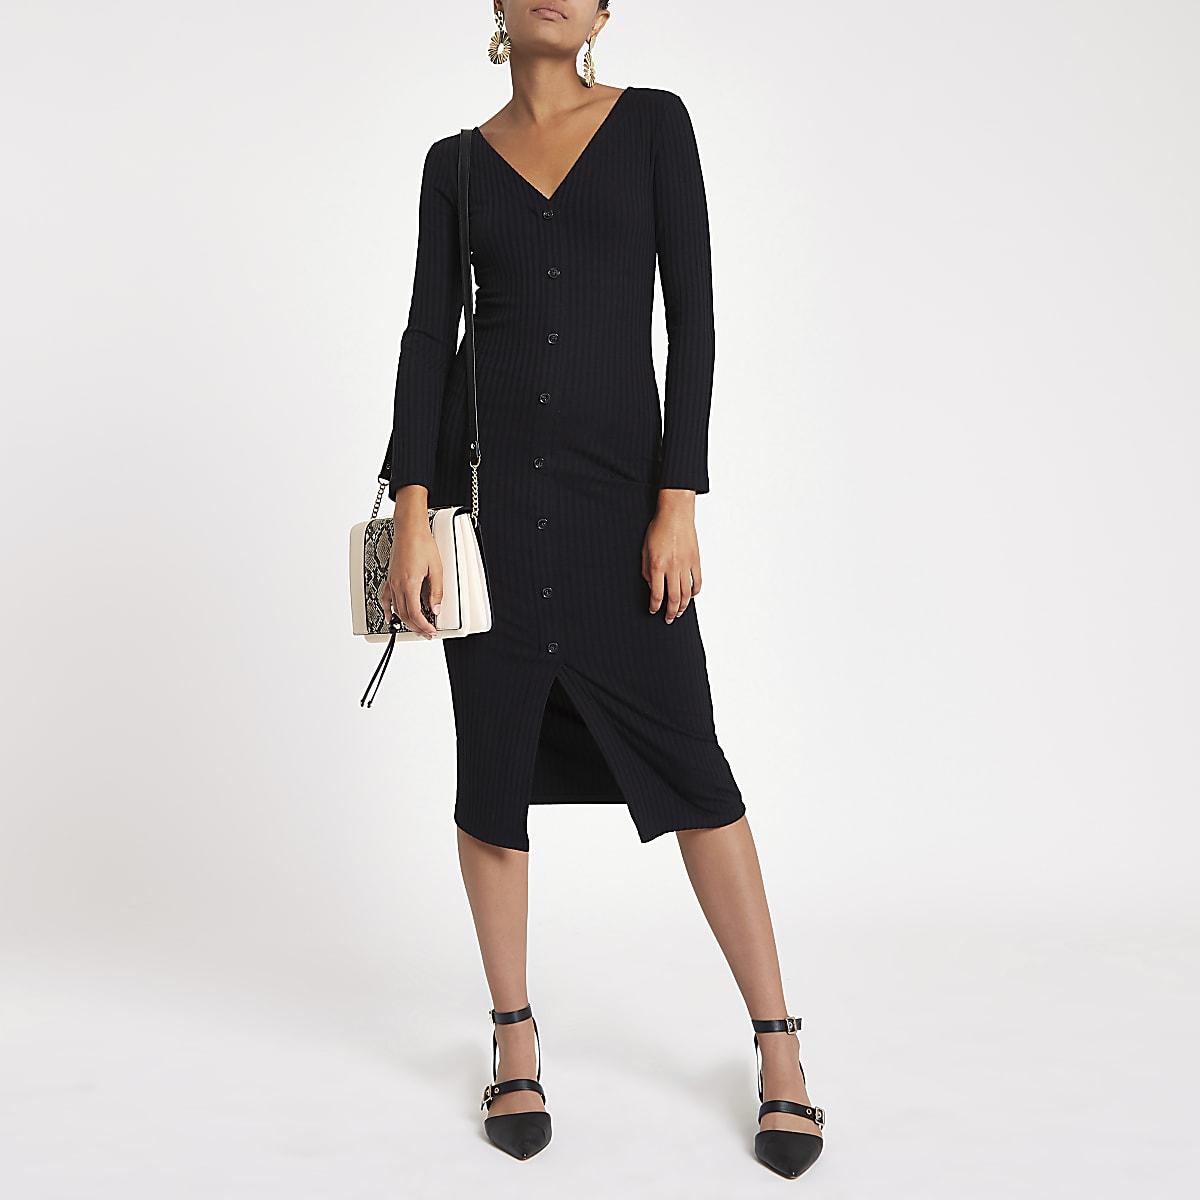 01b69342d Black ribbed button front bodycon dress - Bodycon Dresses - Dresses - women